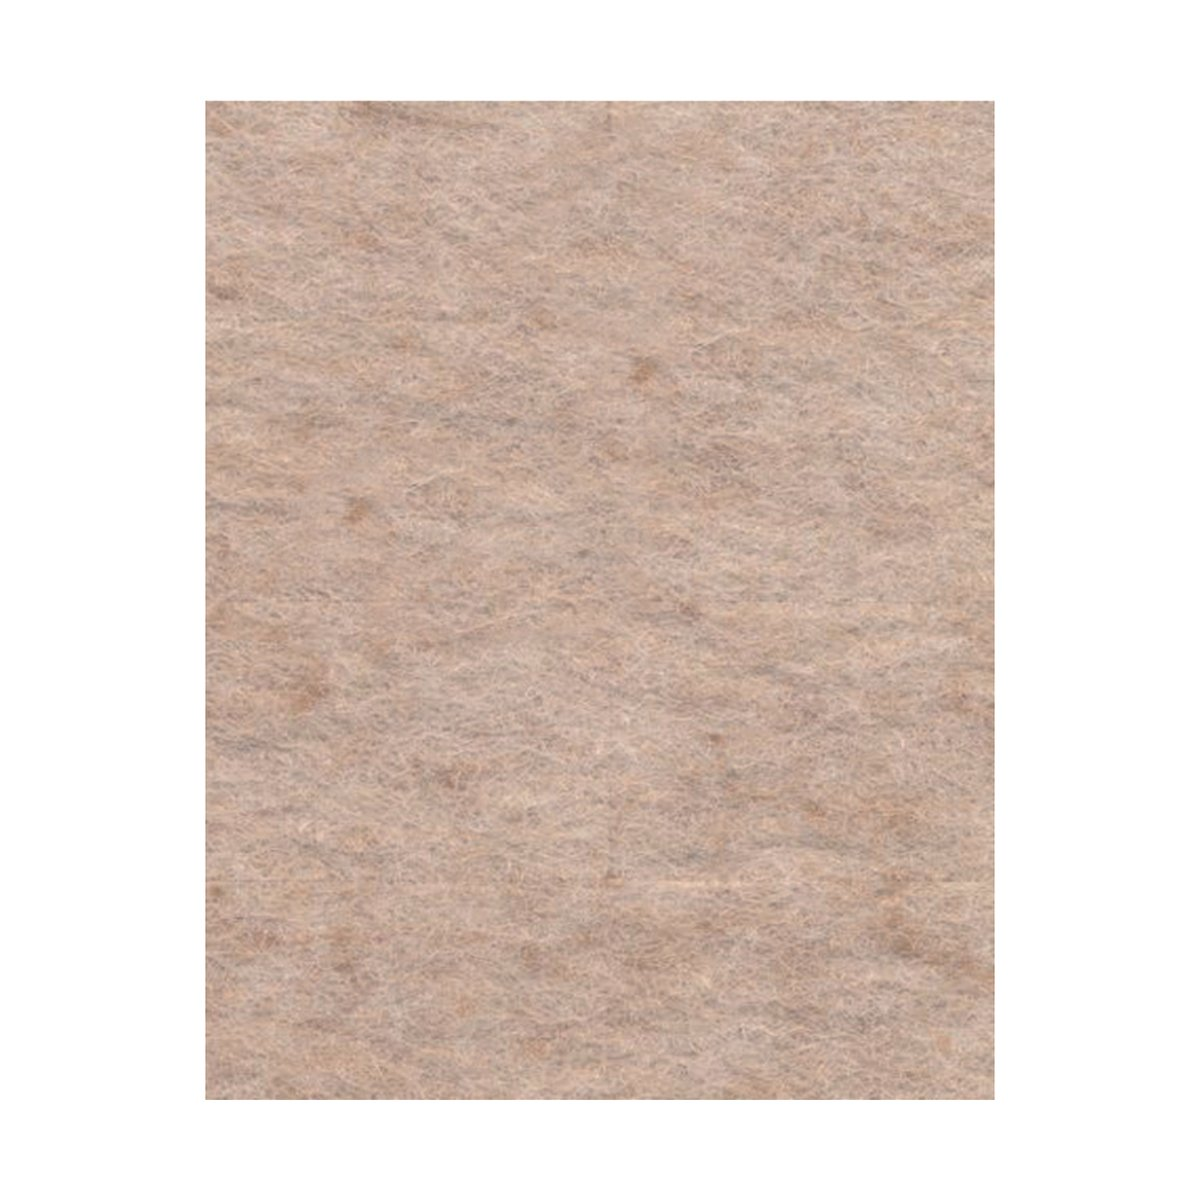 UU003708433 beige 3/M Filzgleiter